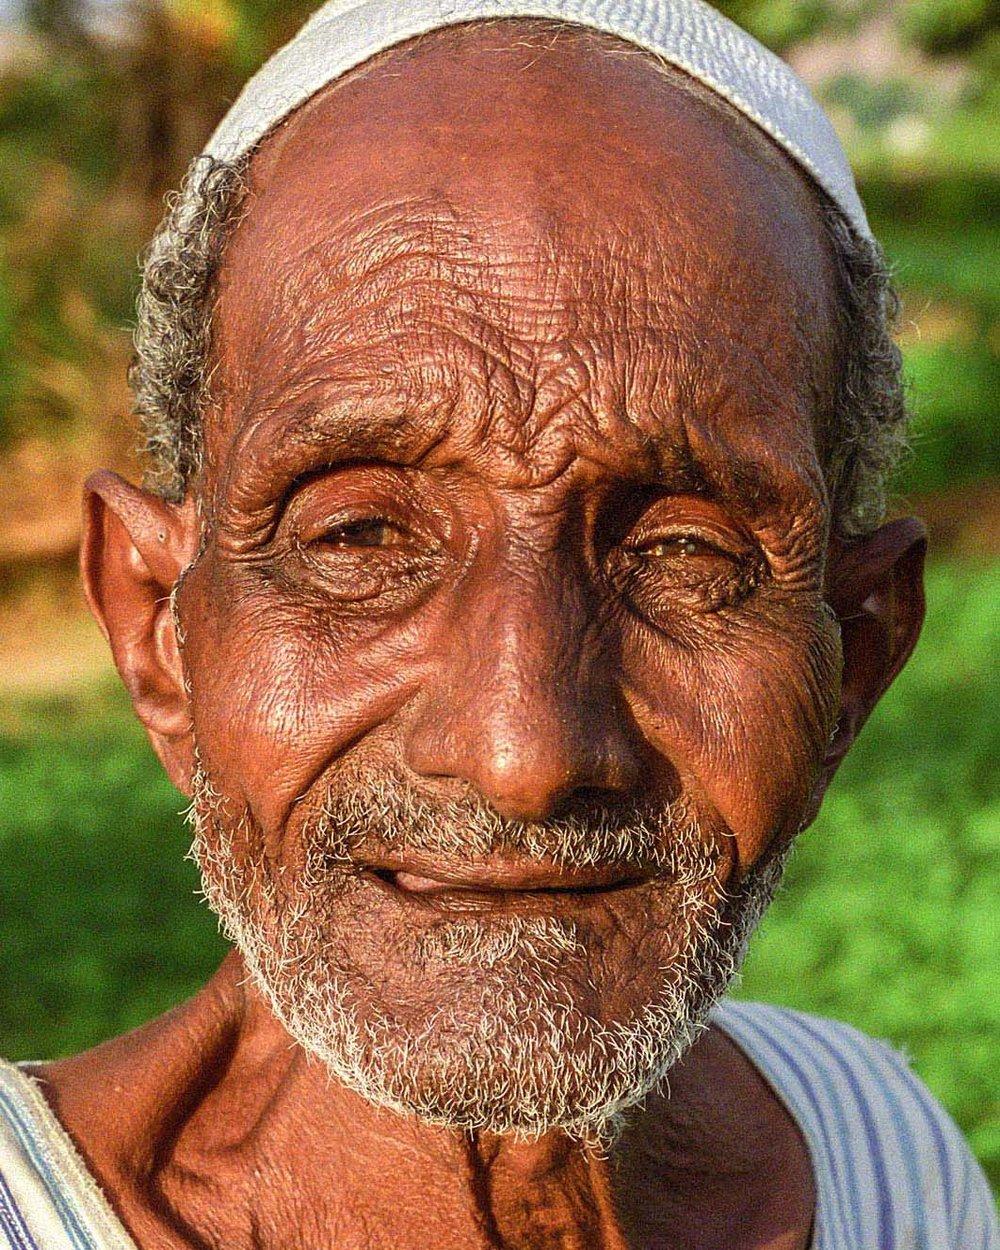 Elderly Nubian man Egypt